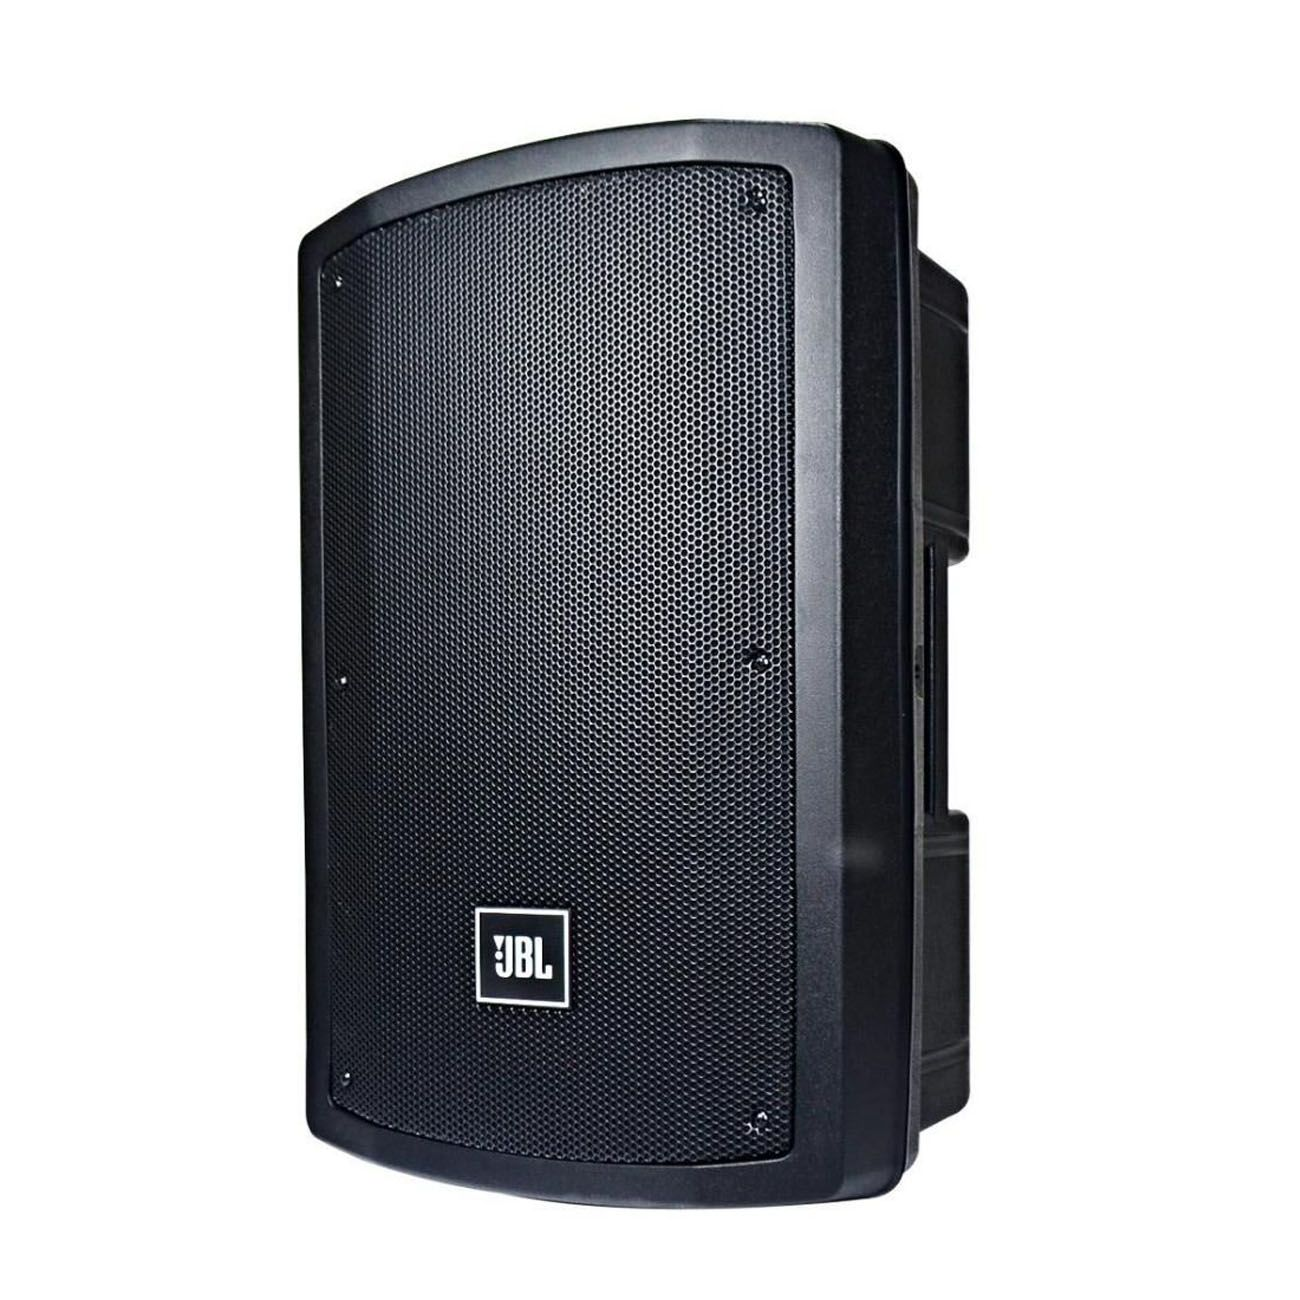 Caixa Acustica Ativa Jbl Js15 Bt 15 Polegadas 200w Rms Usb / Sd/ Bluetooth / Folder